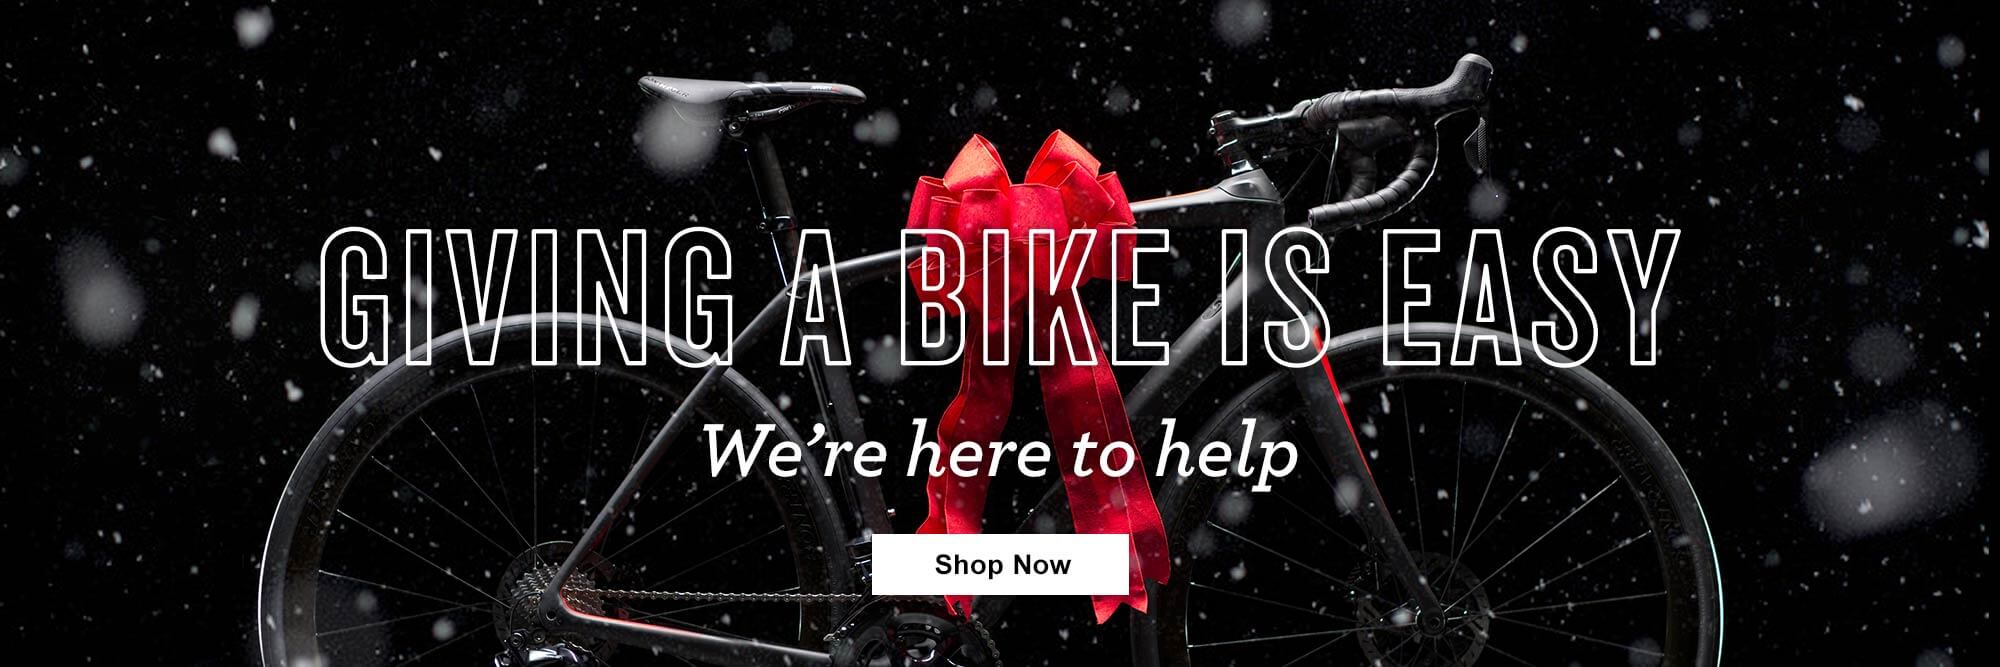 """cycling holiday gifts"""